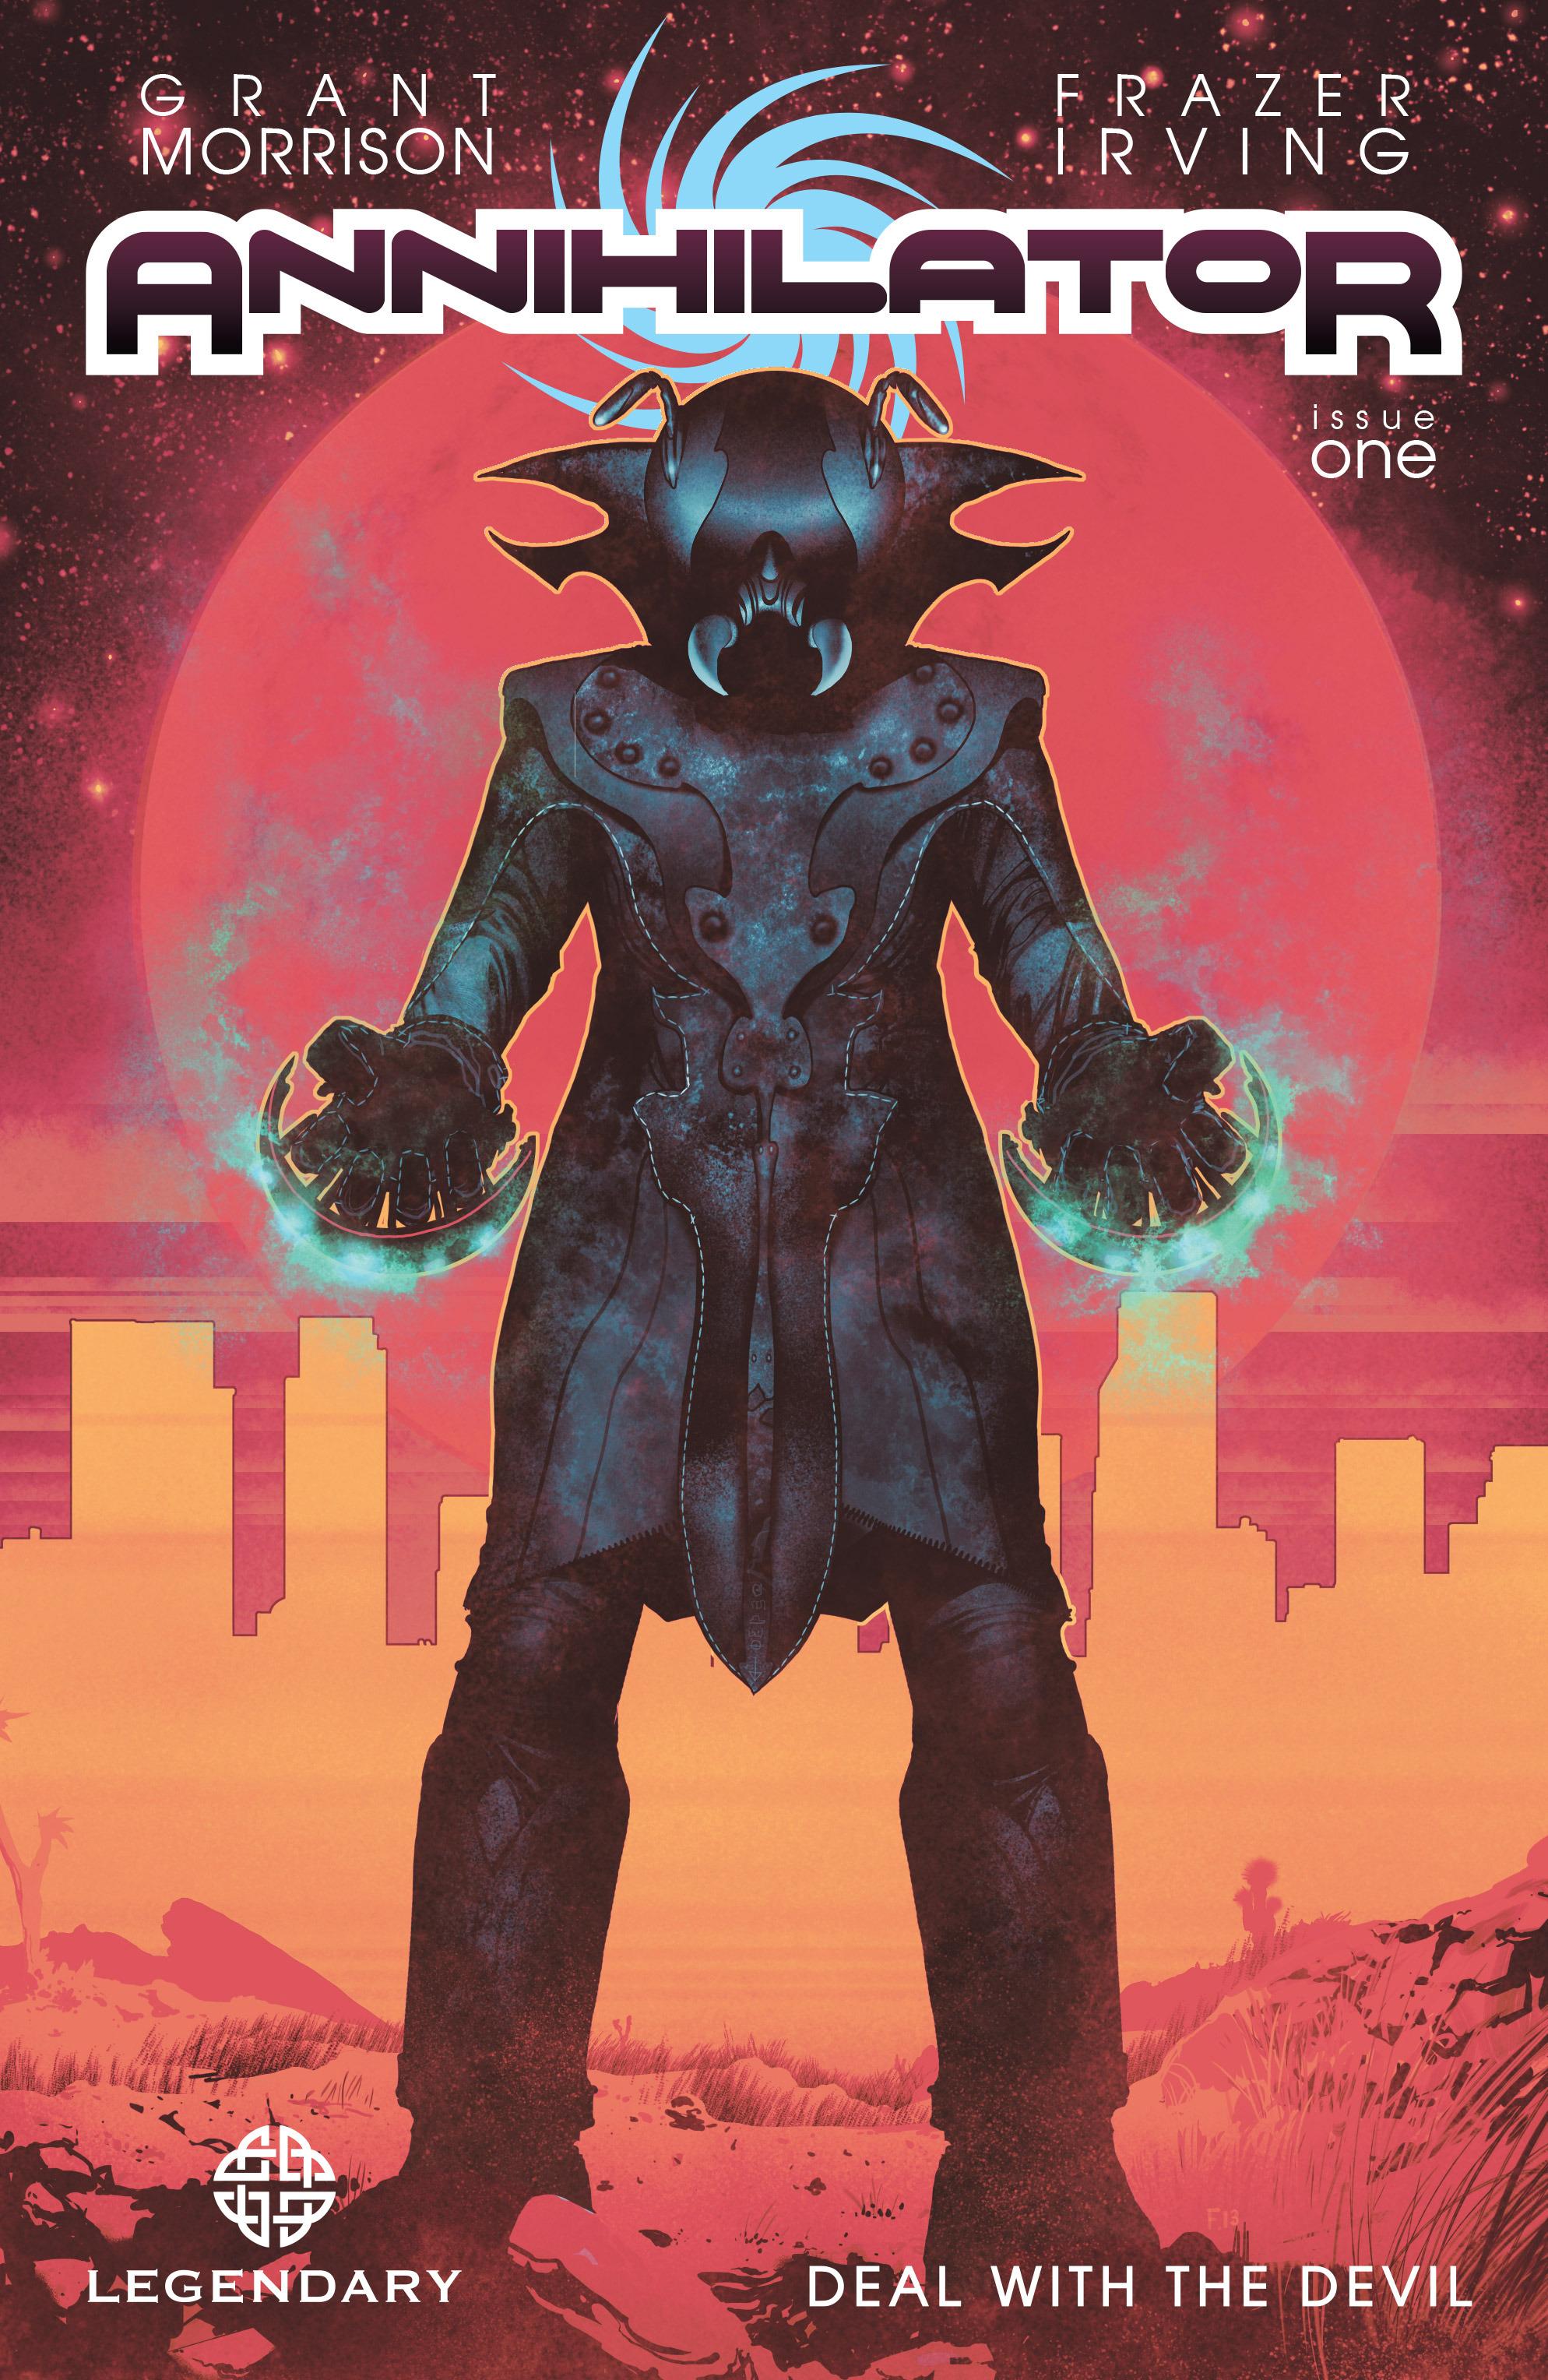 Read online Annihilator comic -  Issue #1 - 1